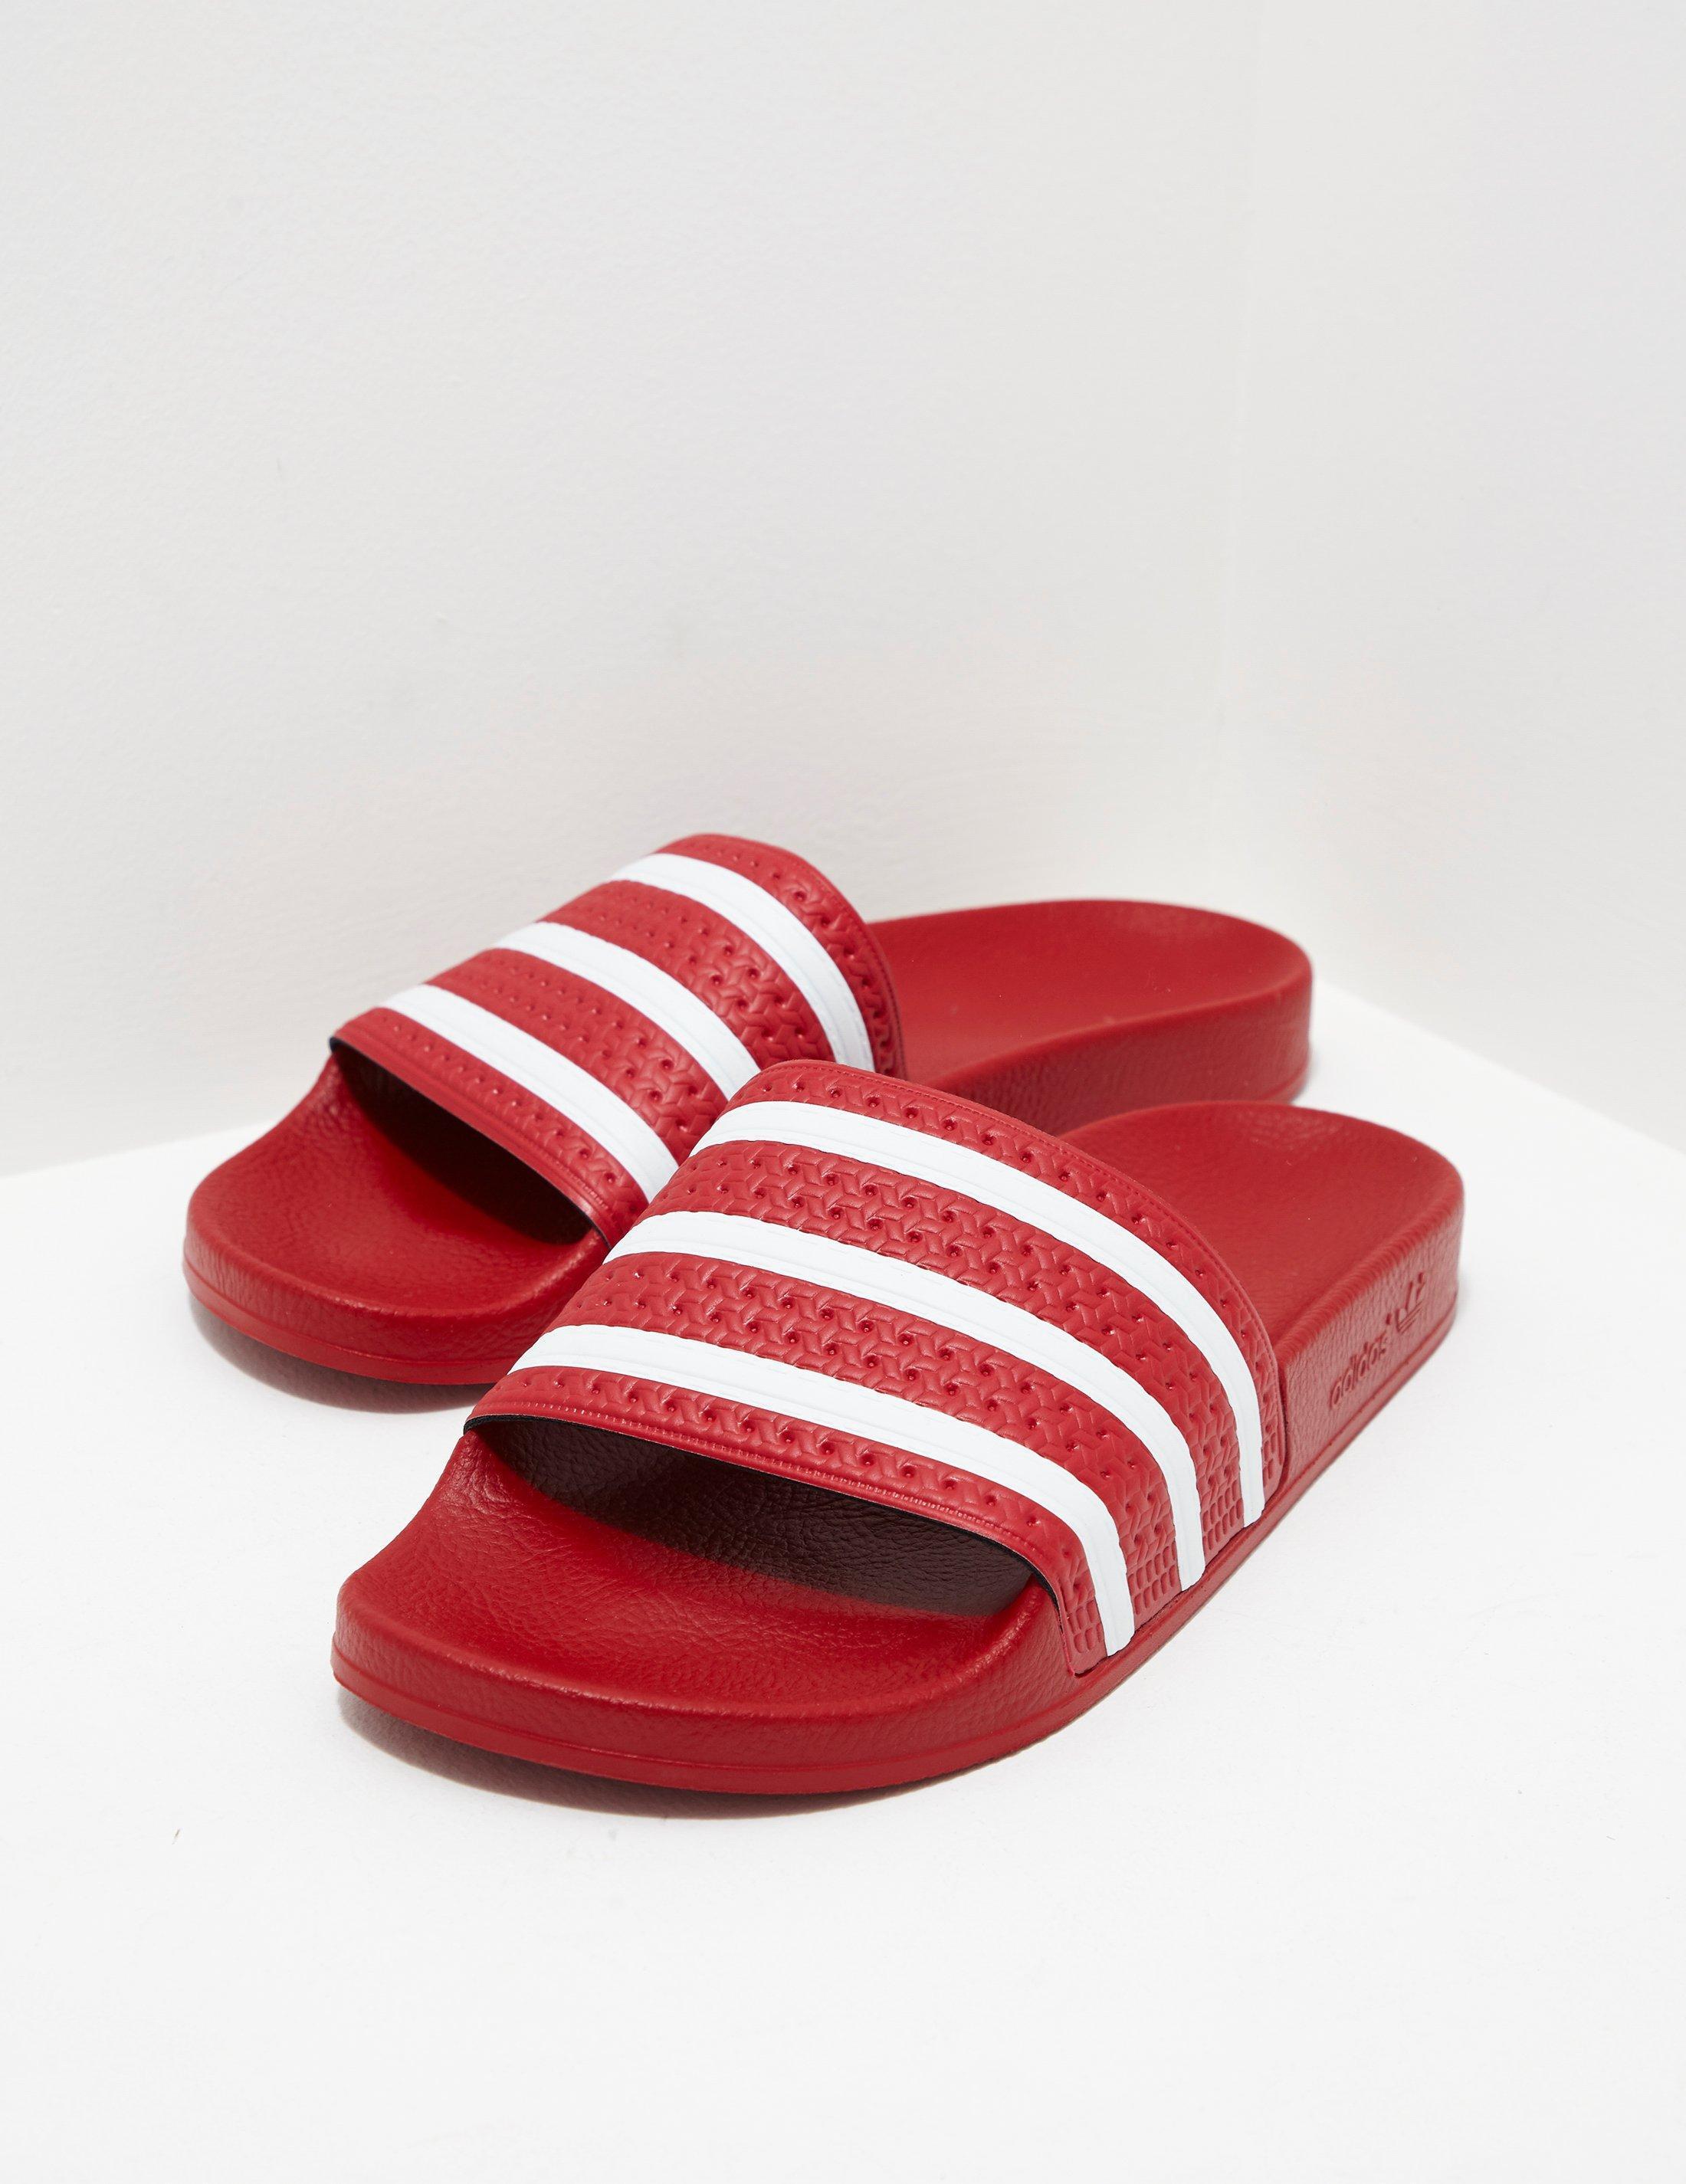 75327655a4c6 Adidas Originals Mens Adilette Slides Red in Red for Men - Lyst